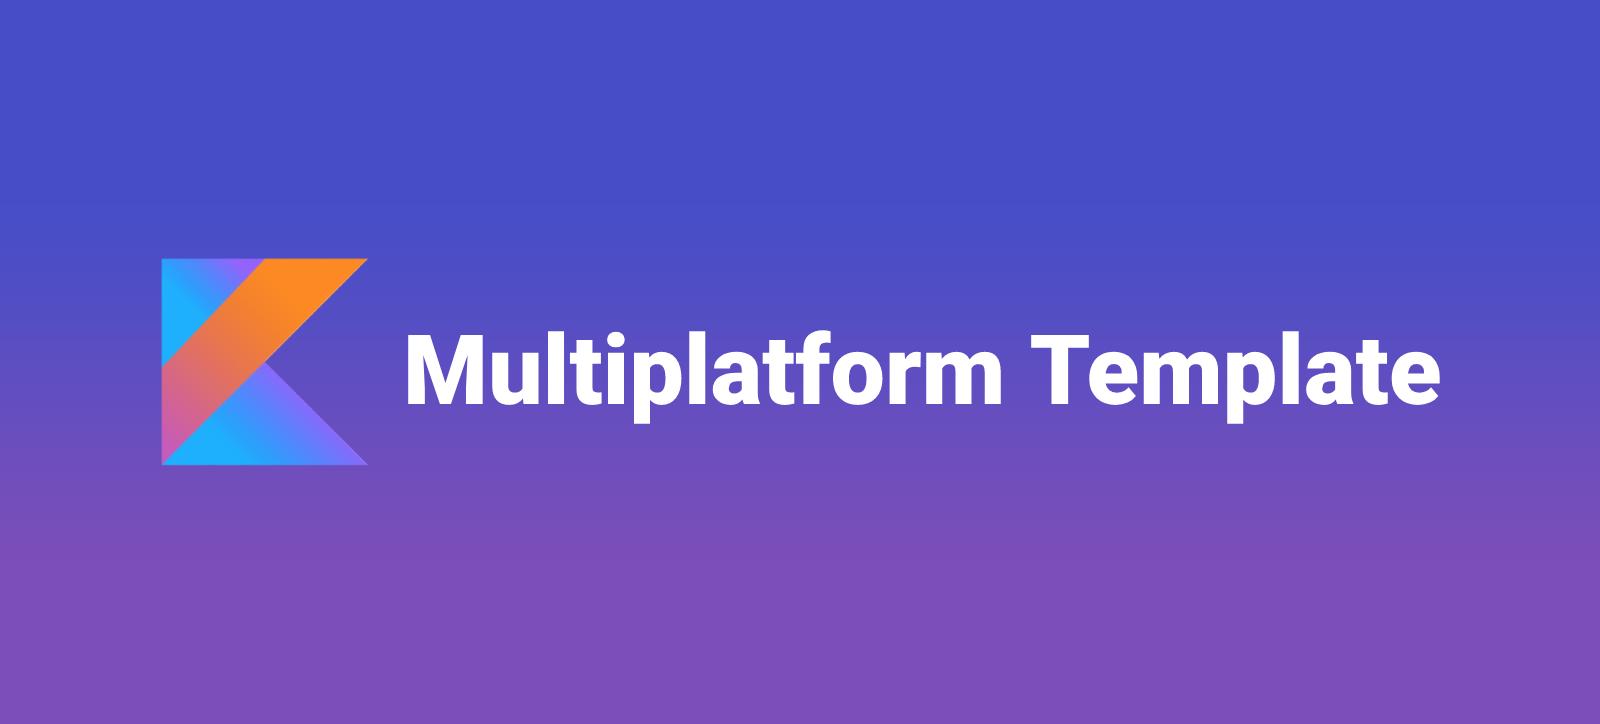 Kotlin Multiplatform Template